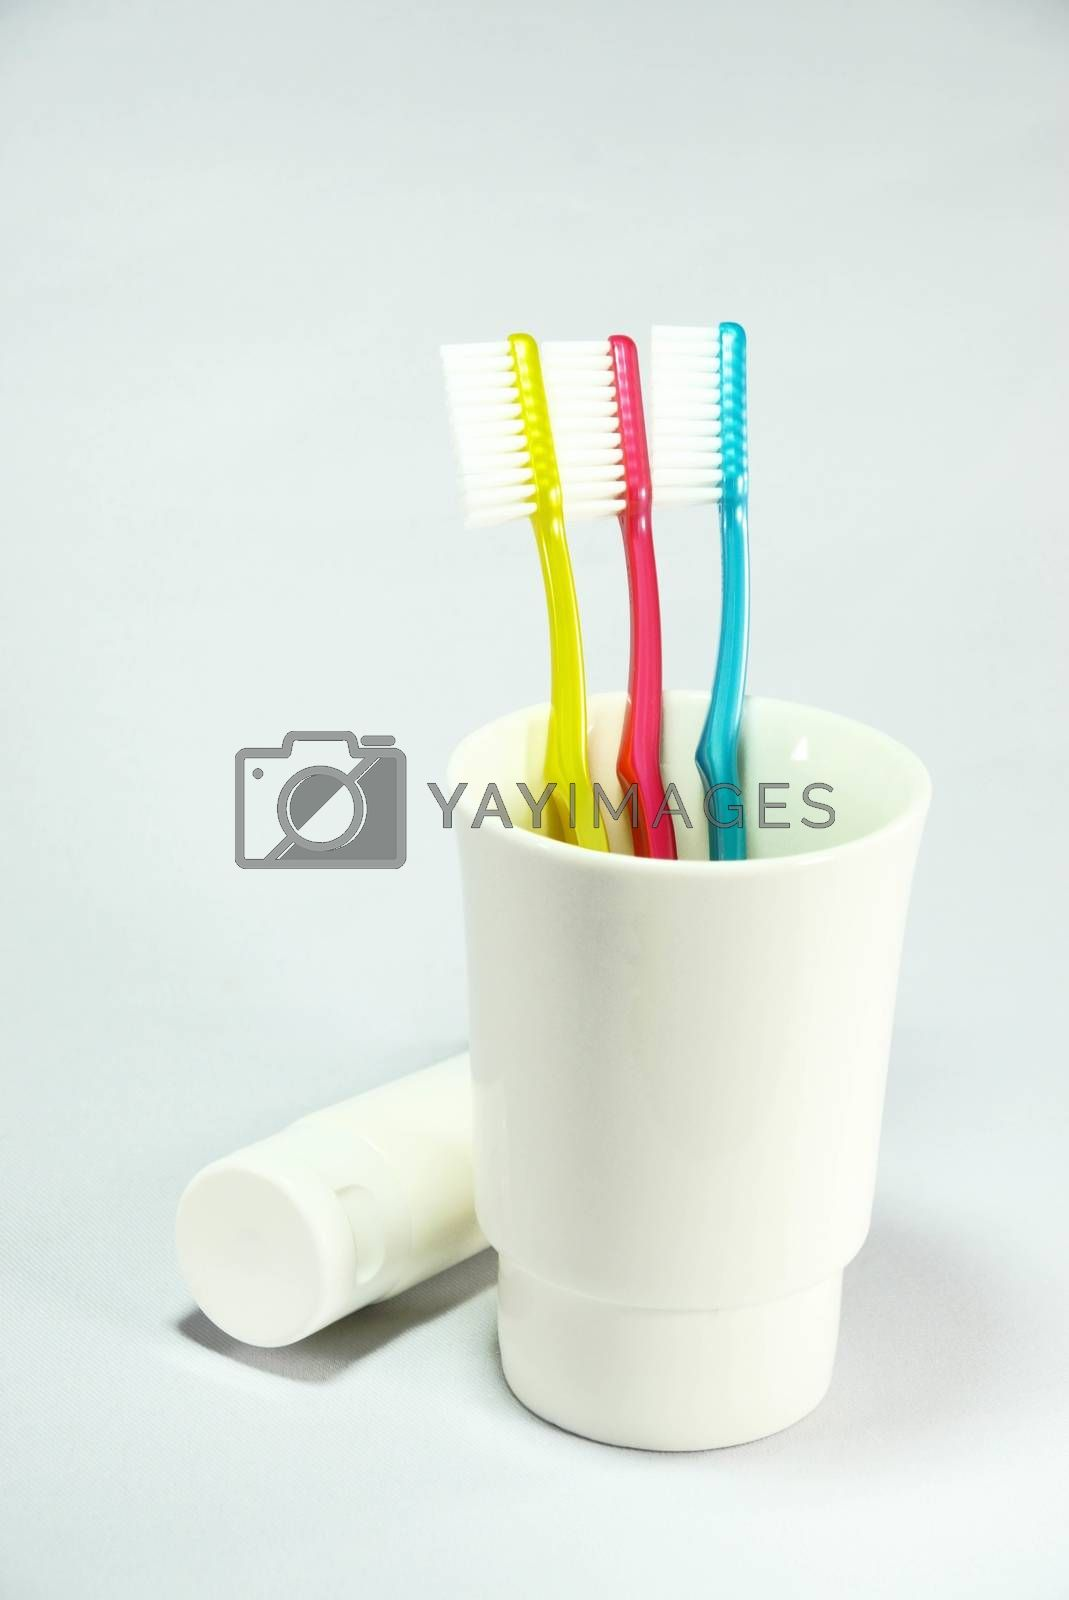 Royalty free image of toothbrush set by nattapatt